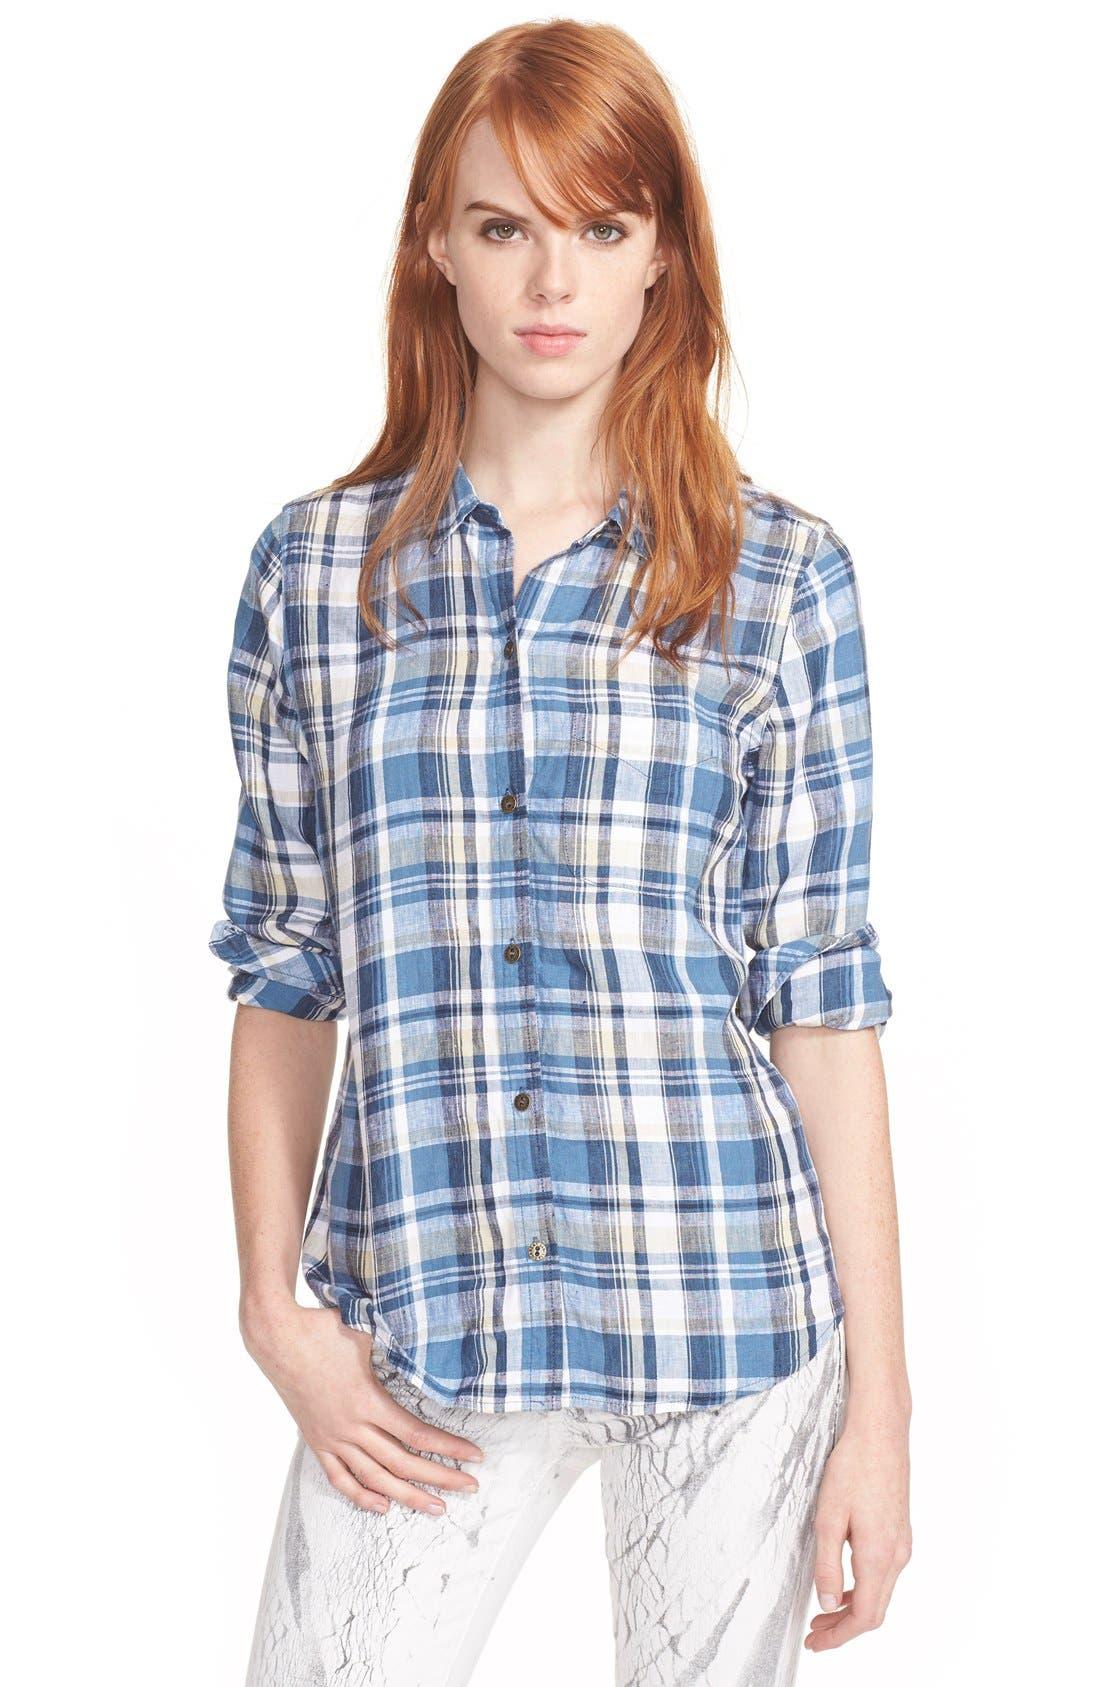 Main Image - Current/Elliott 'The Slim Boy' Plaid Linen Shirt